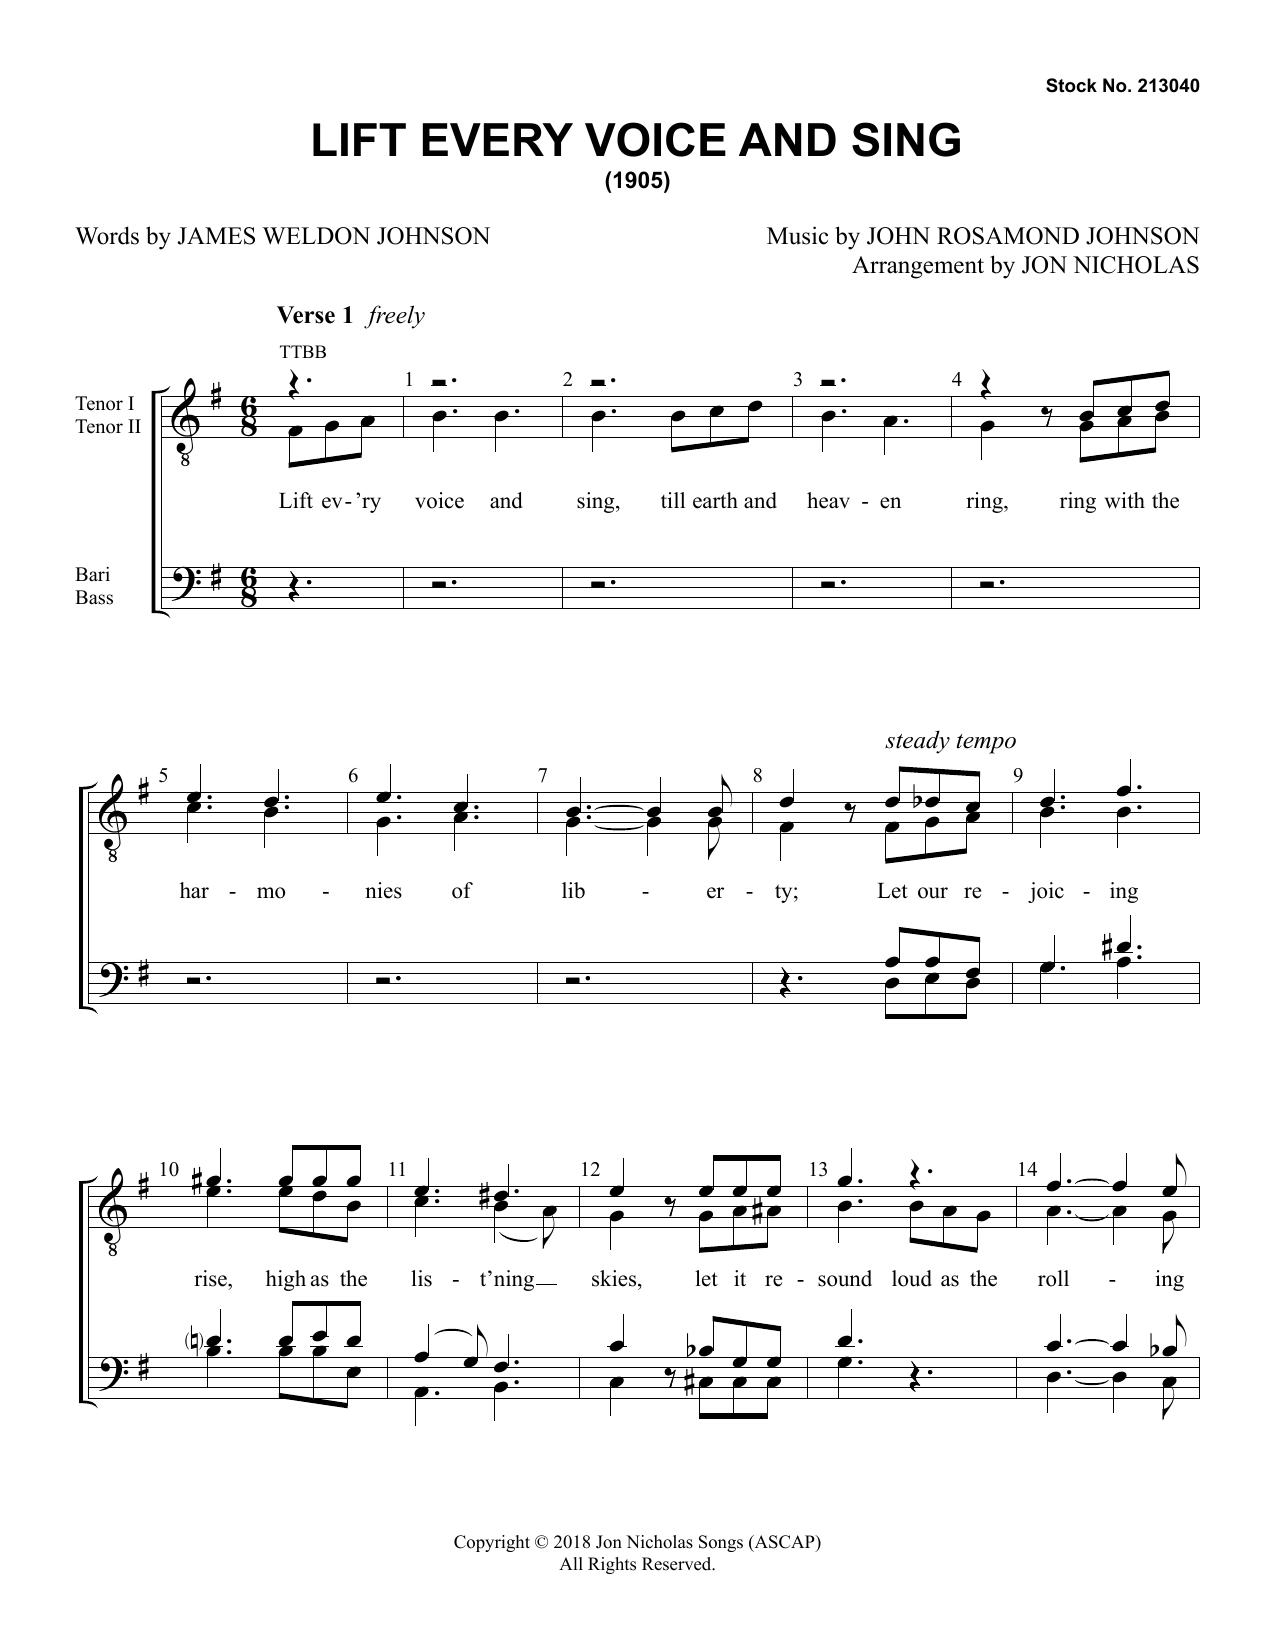 Lift Every Voice and Sing (arr. Jon Nicholas) (Choir)